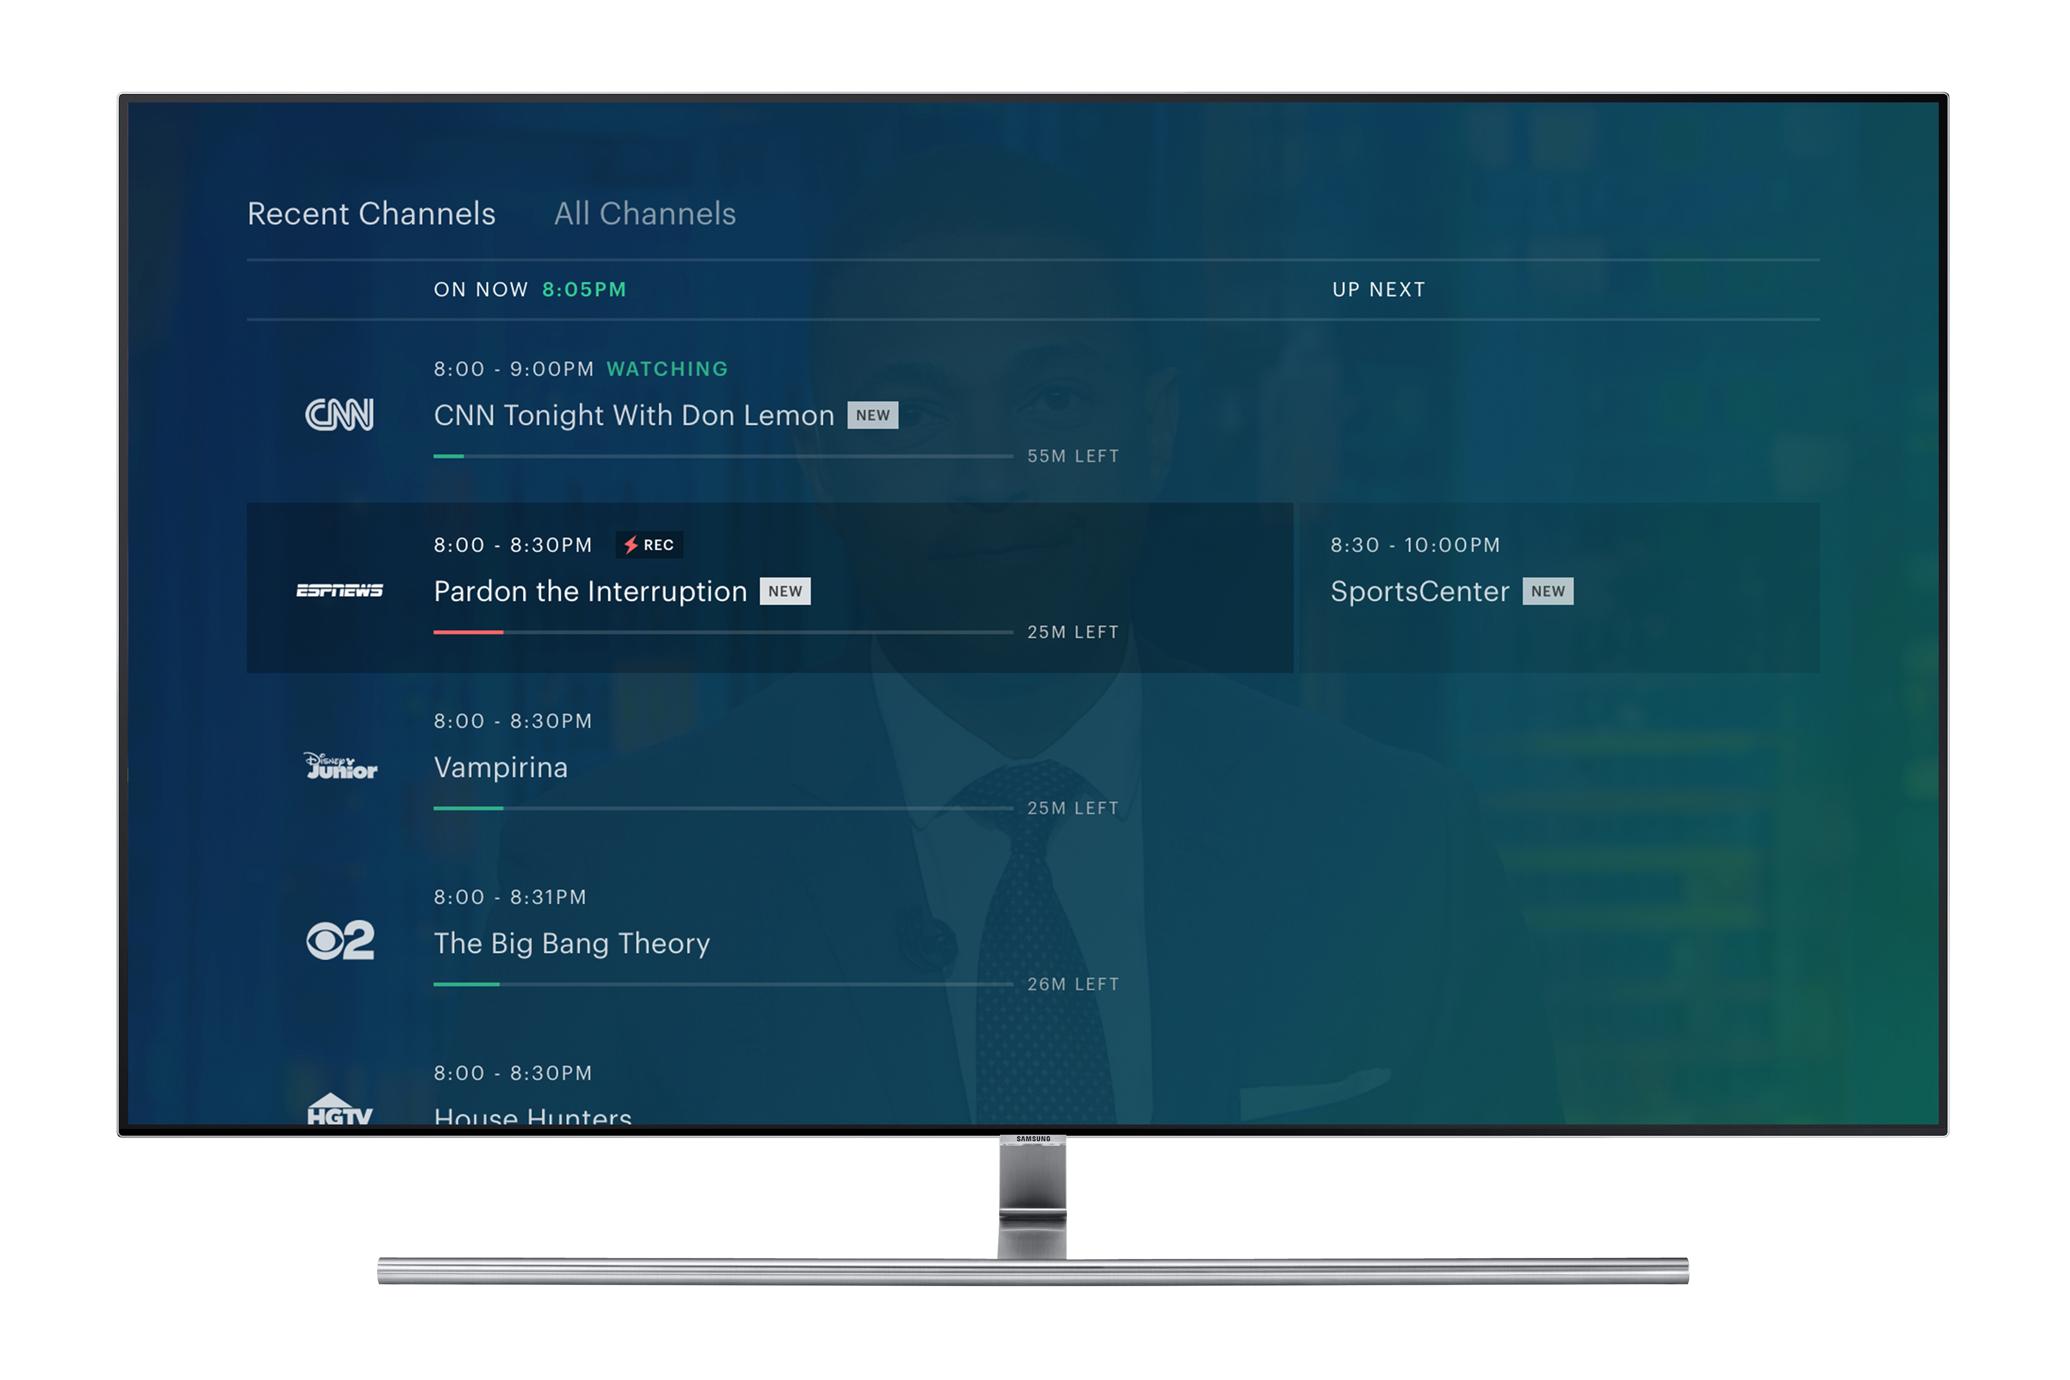 Hulu Live TV guide arrives on Nintendo Switch, Apple TV, more